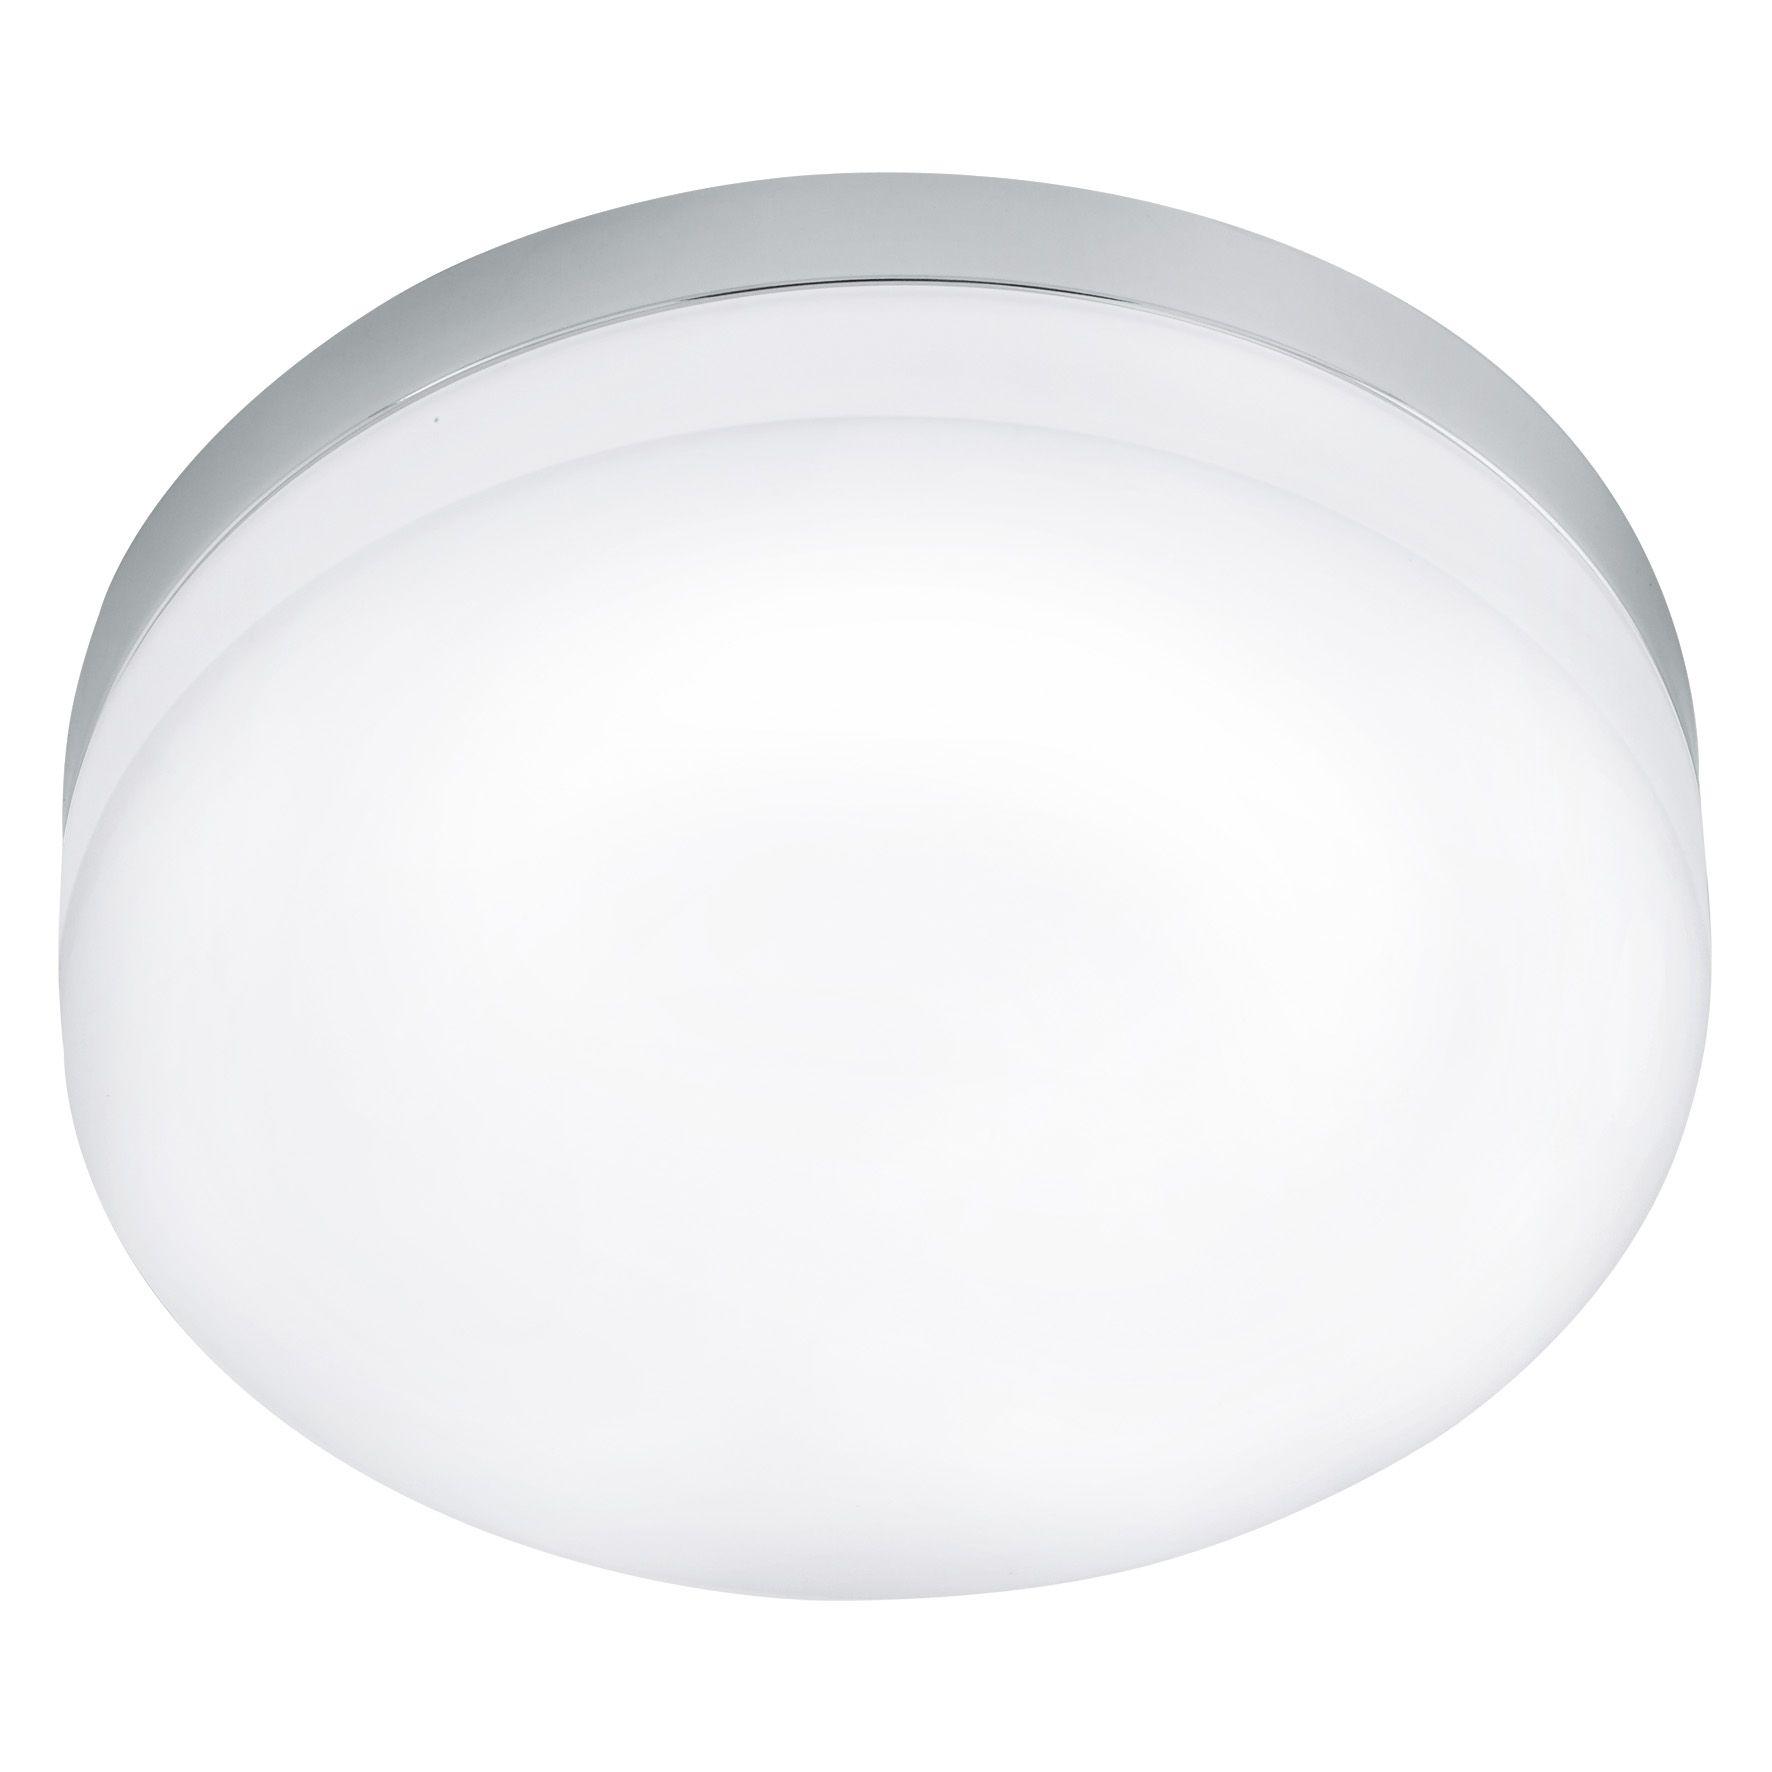 Led Bathroom Lights Ceiling